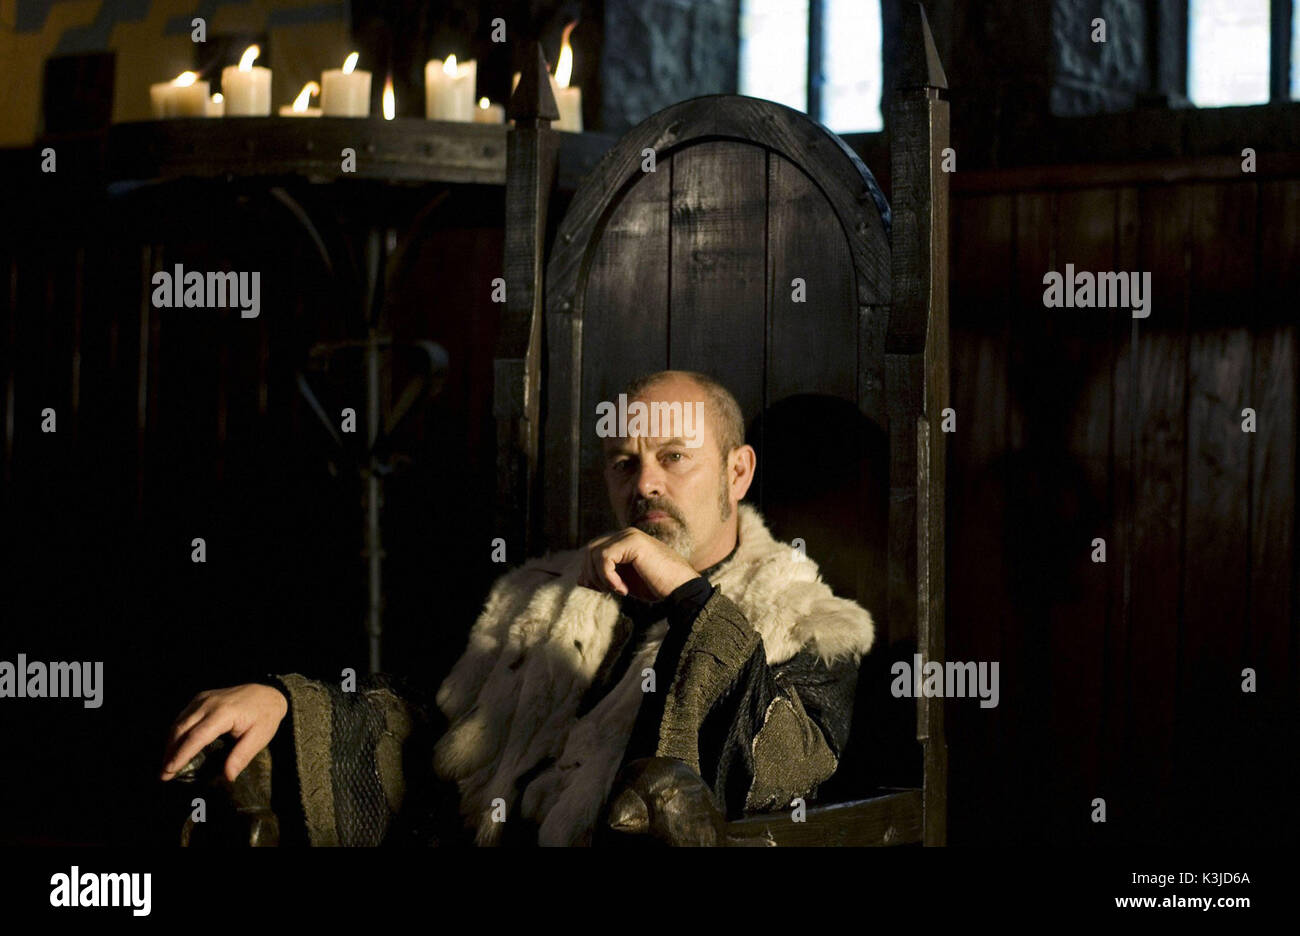 ROBIN HOOD KEITH ALLEN as Sheriff of Nottingham ROBIN HOOD     Date: 2006 - Stock Image